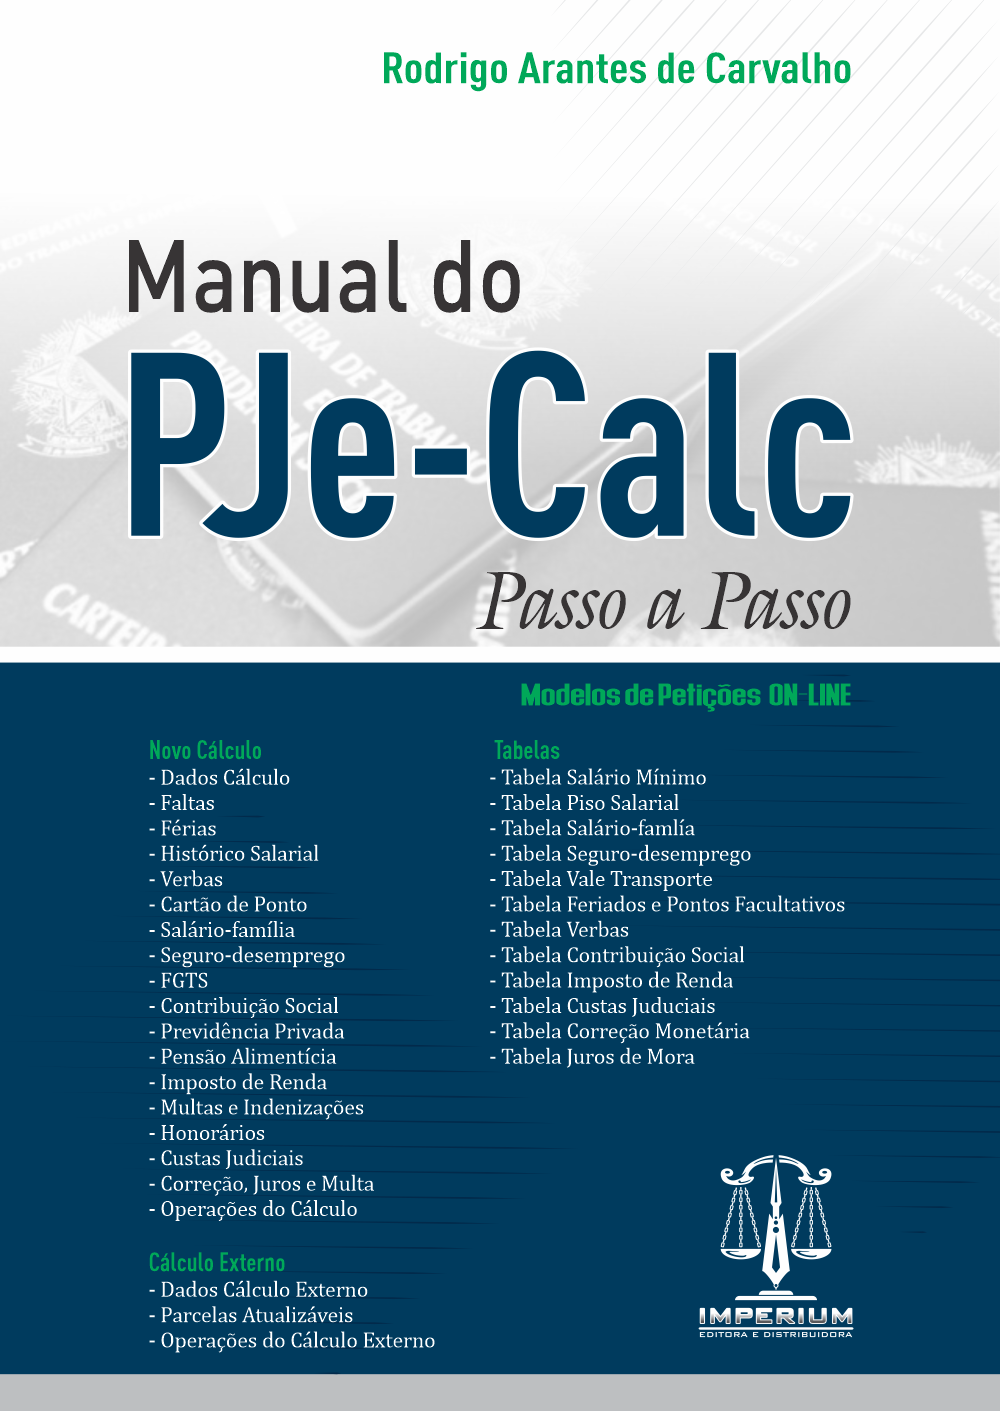 Manual do PJe-Calc - Passo a Passo